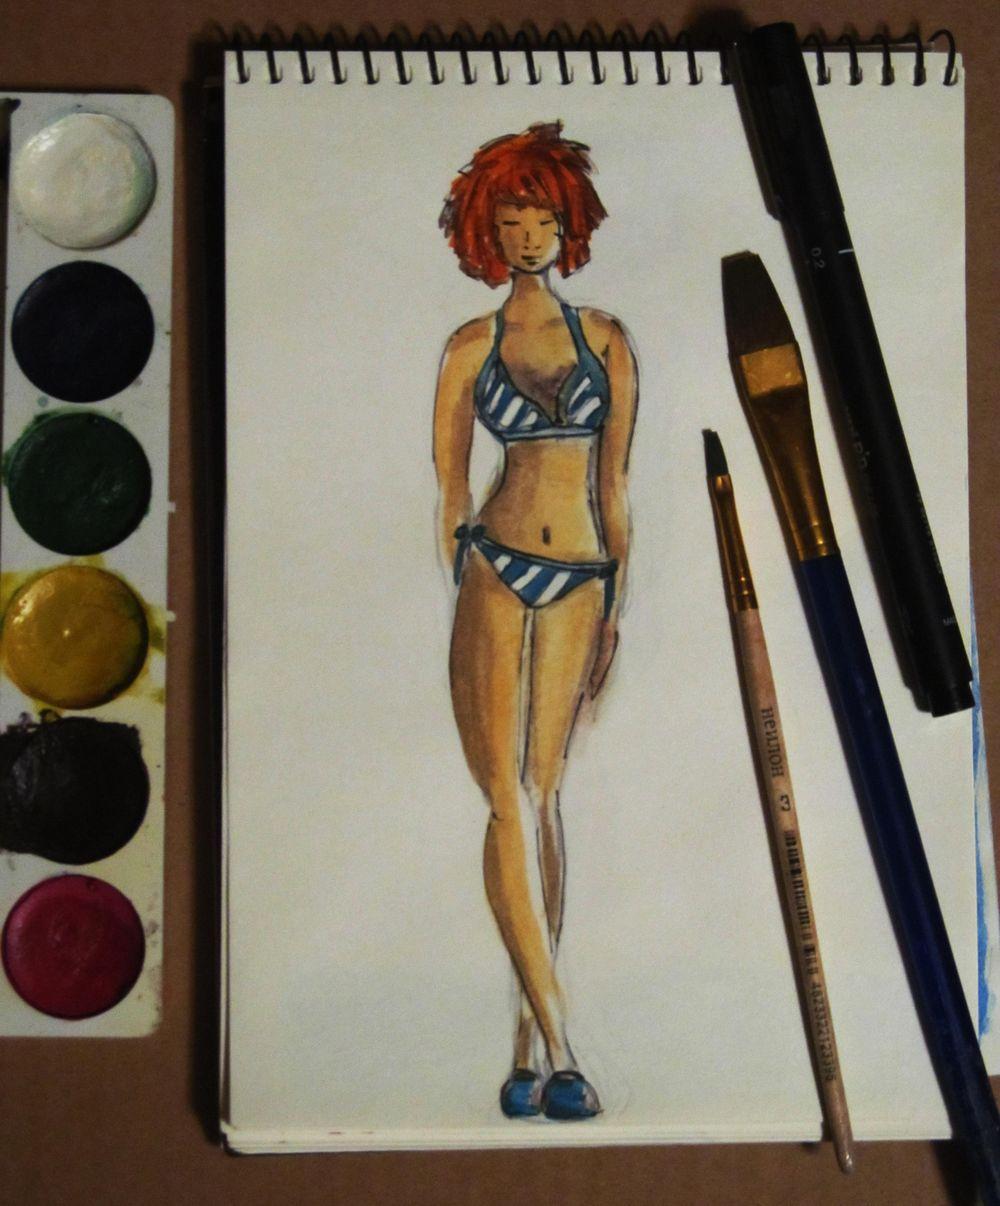 Swimwear Fashion Illustrations - image 1 - student project